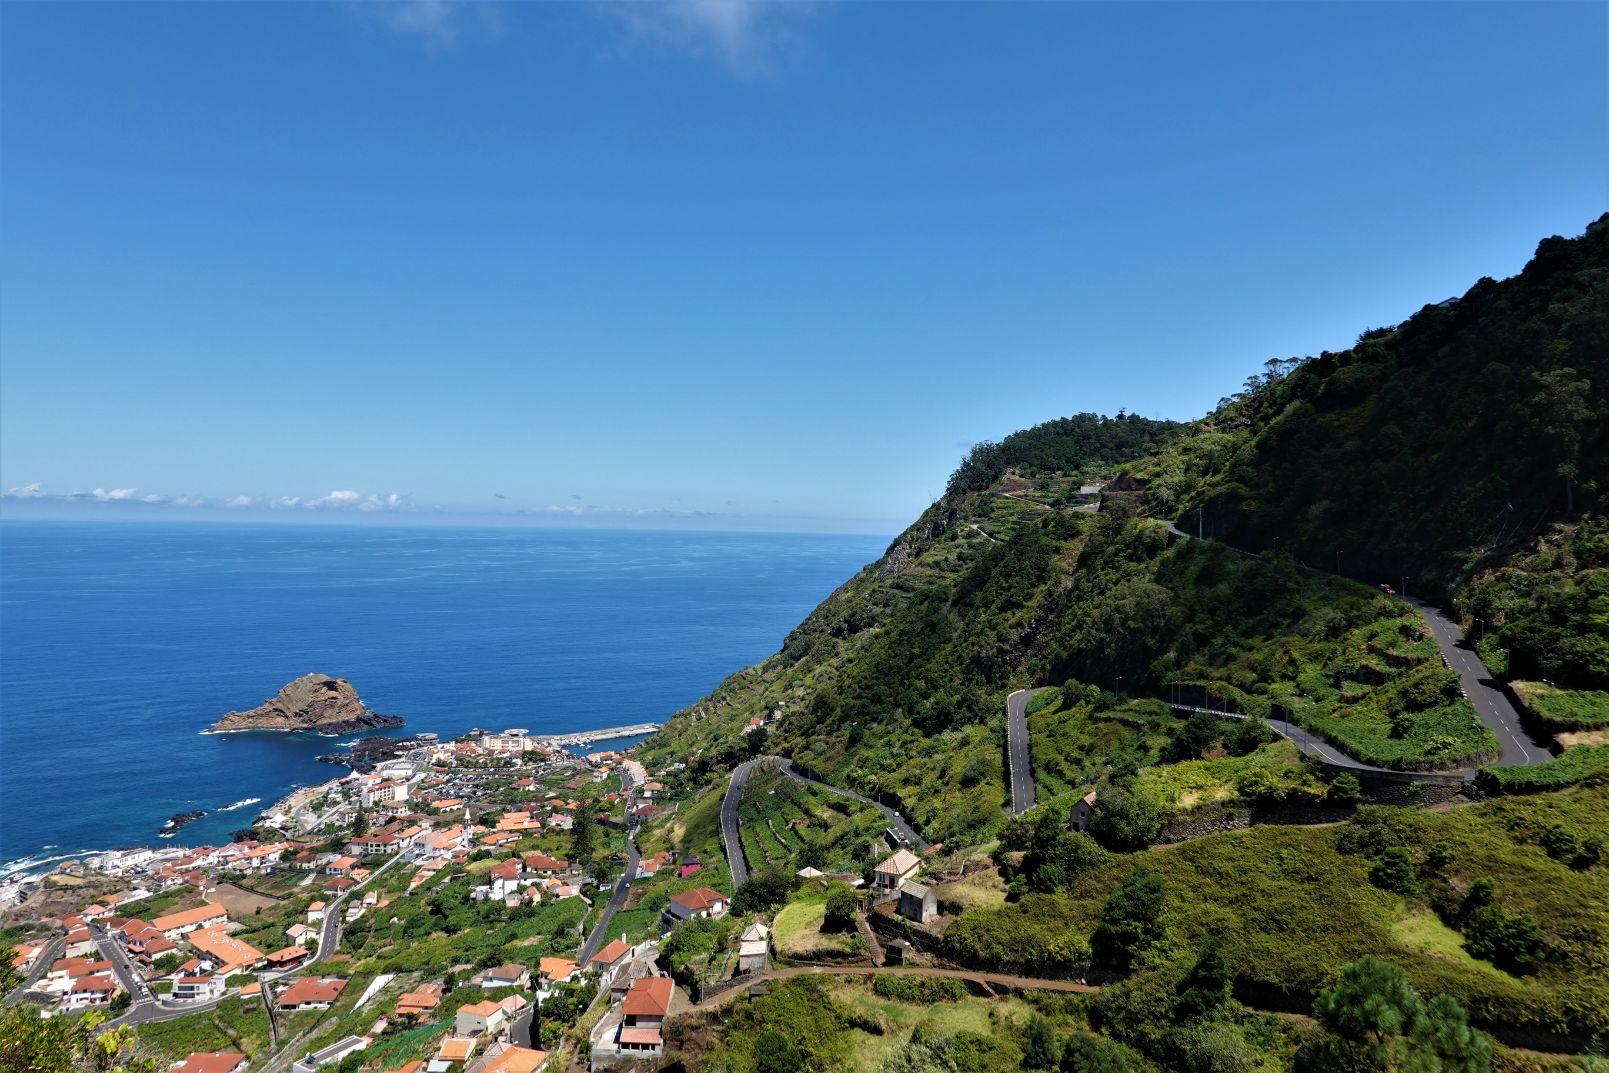 Porto Moniz - klid a nádherná panoramata na madeirském severozápadě